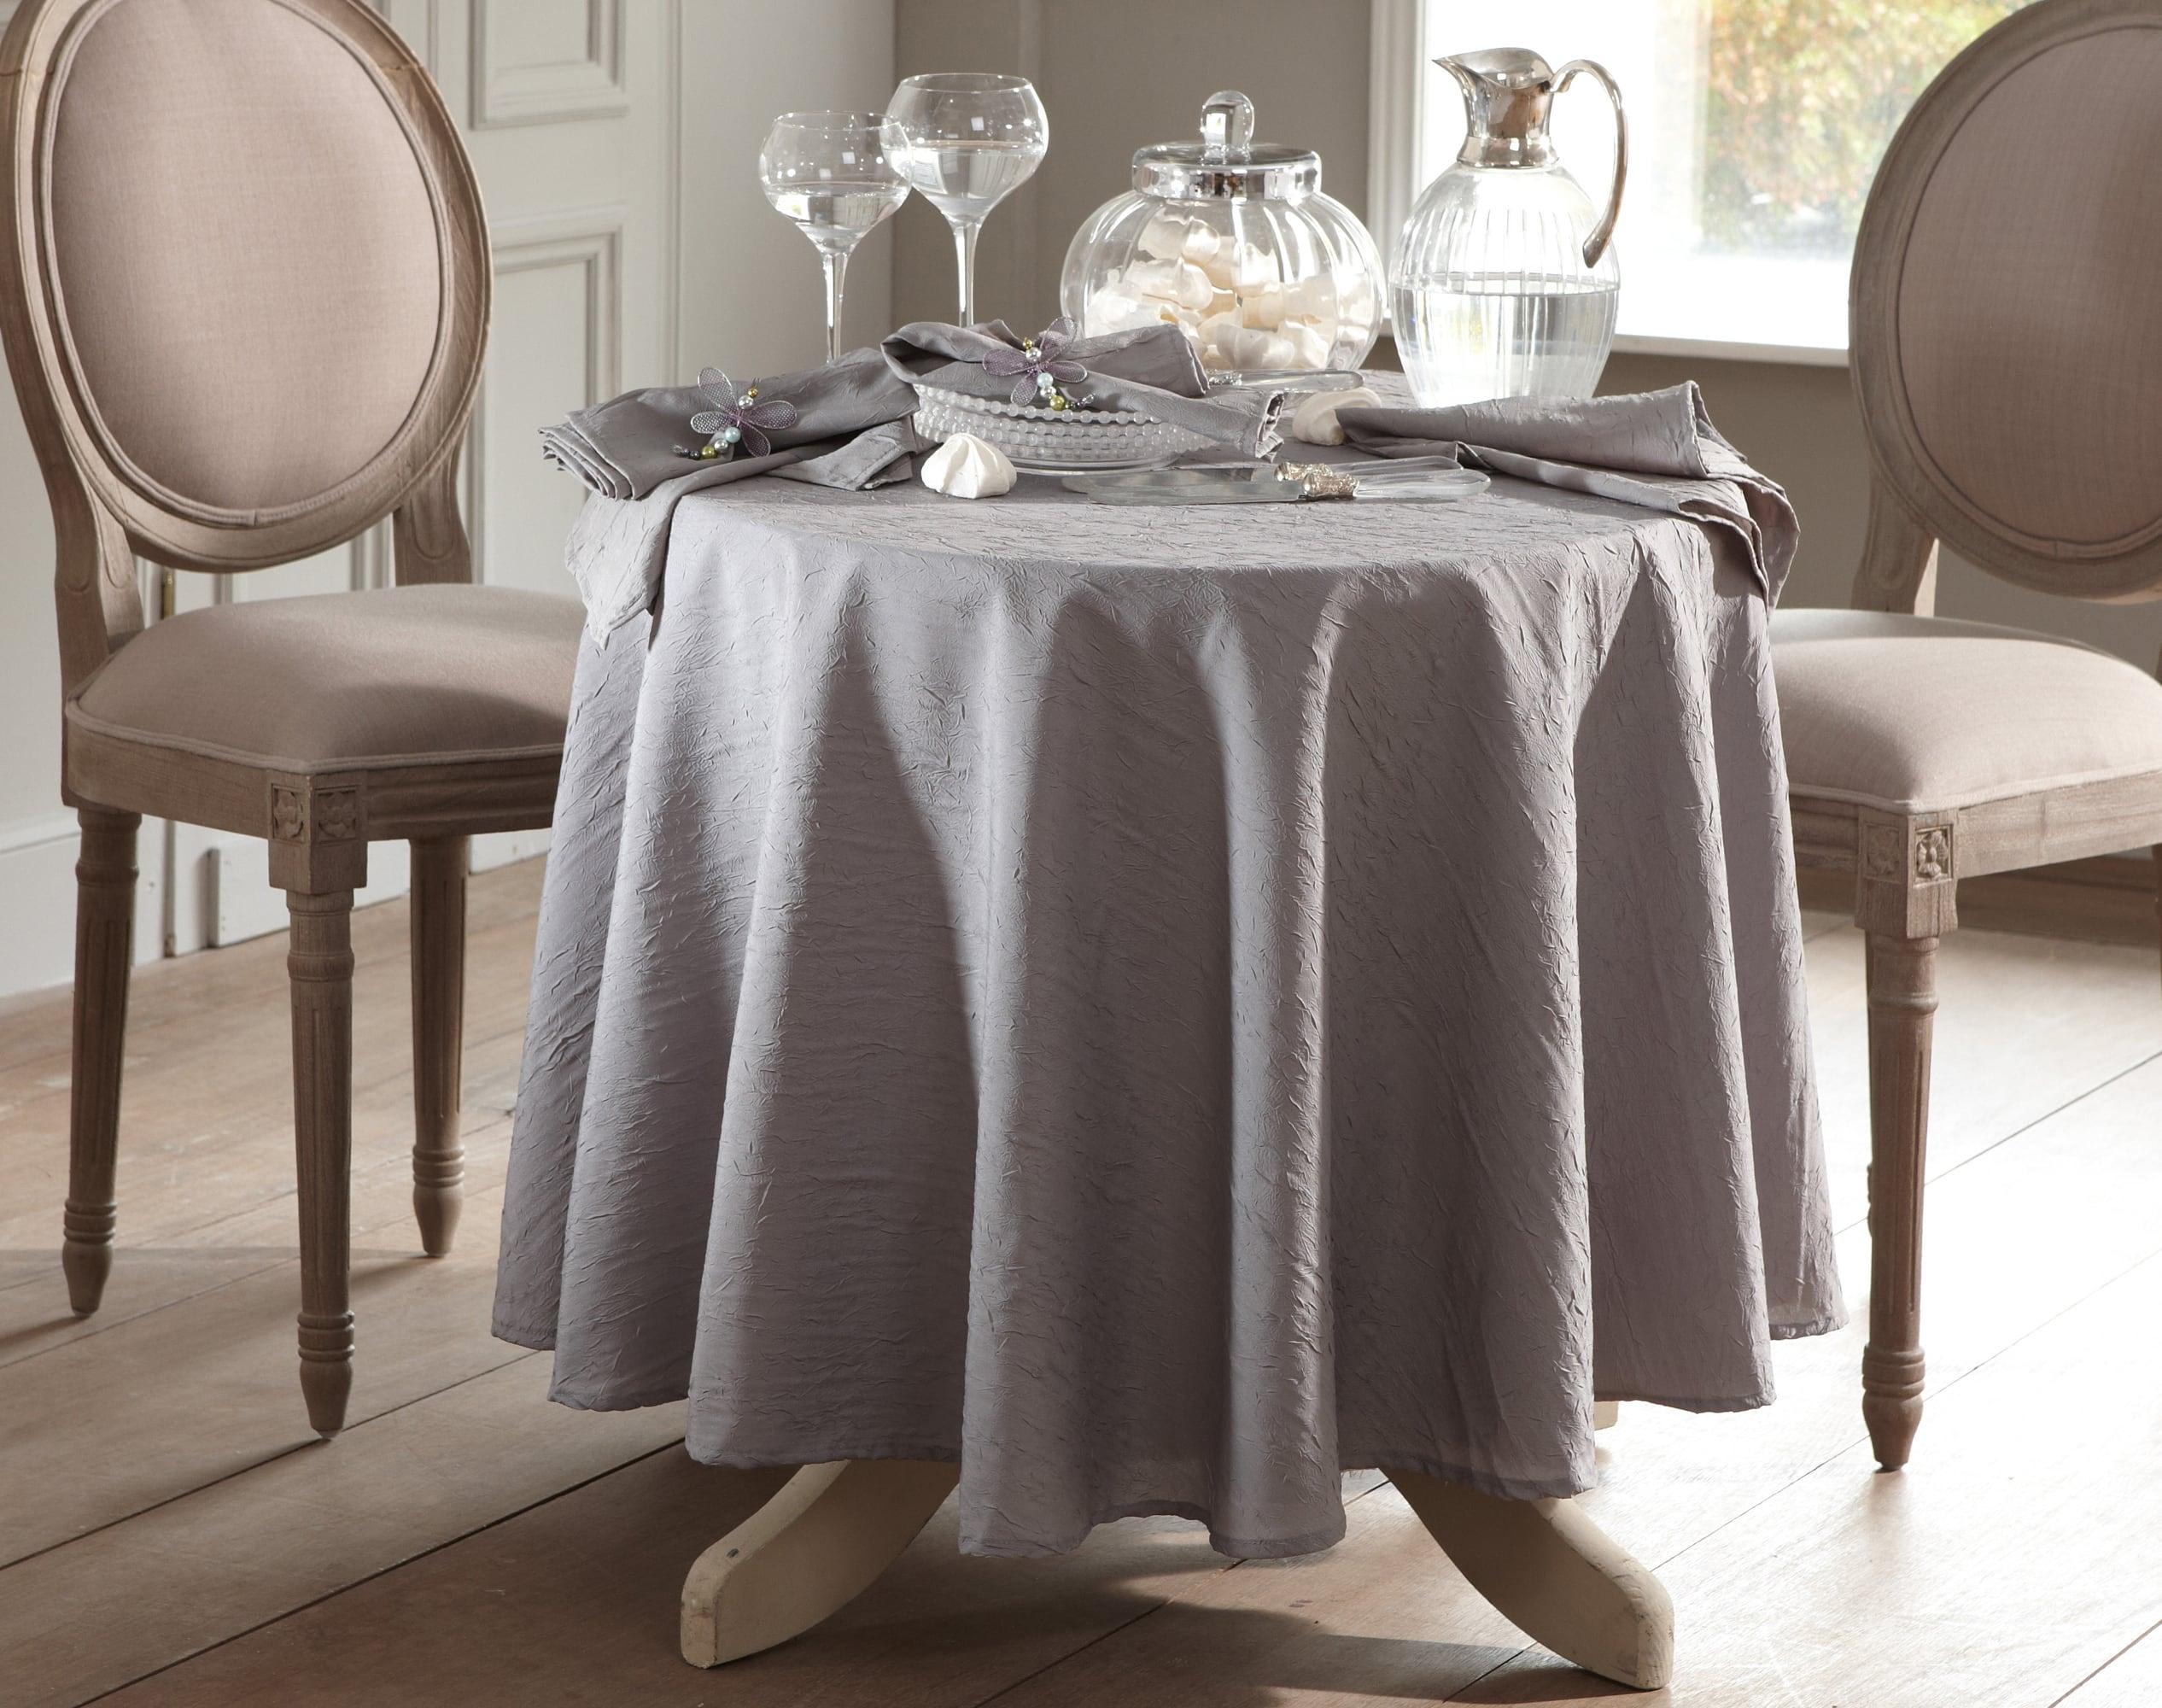 Nappe rectangulaire beige en polyester 150x200